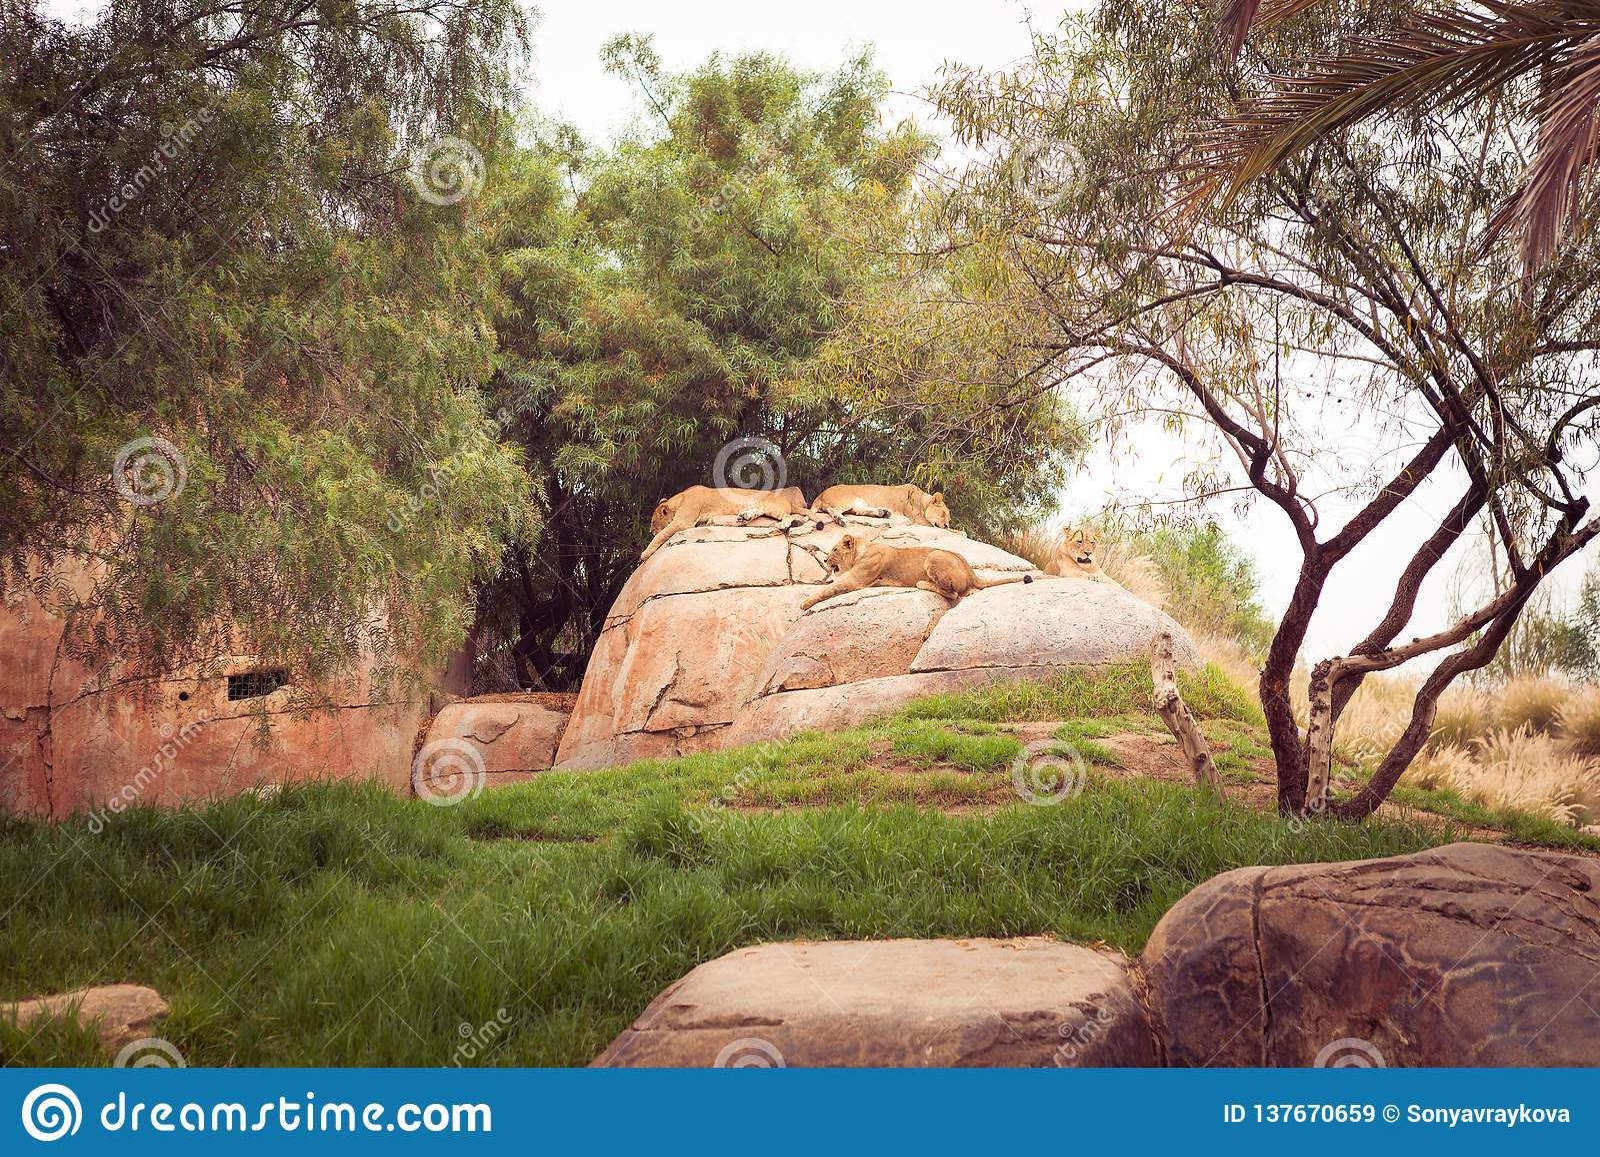 Siesta de los leones - Safari Park San Diego